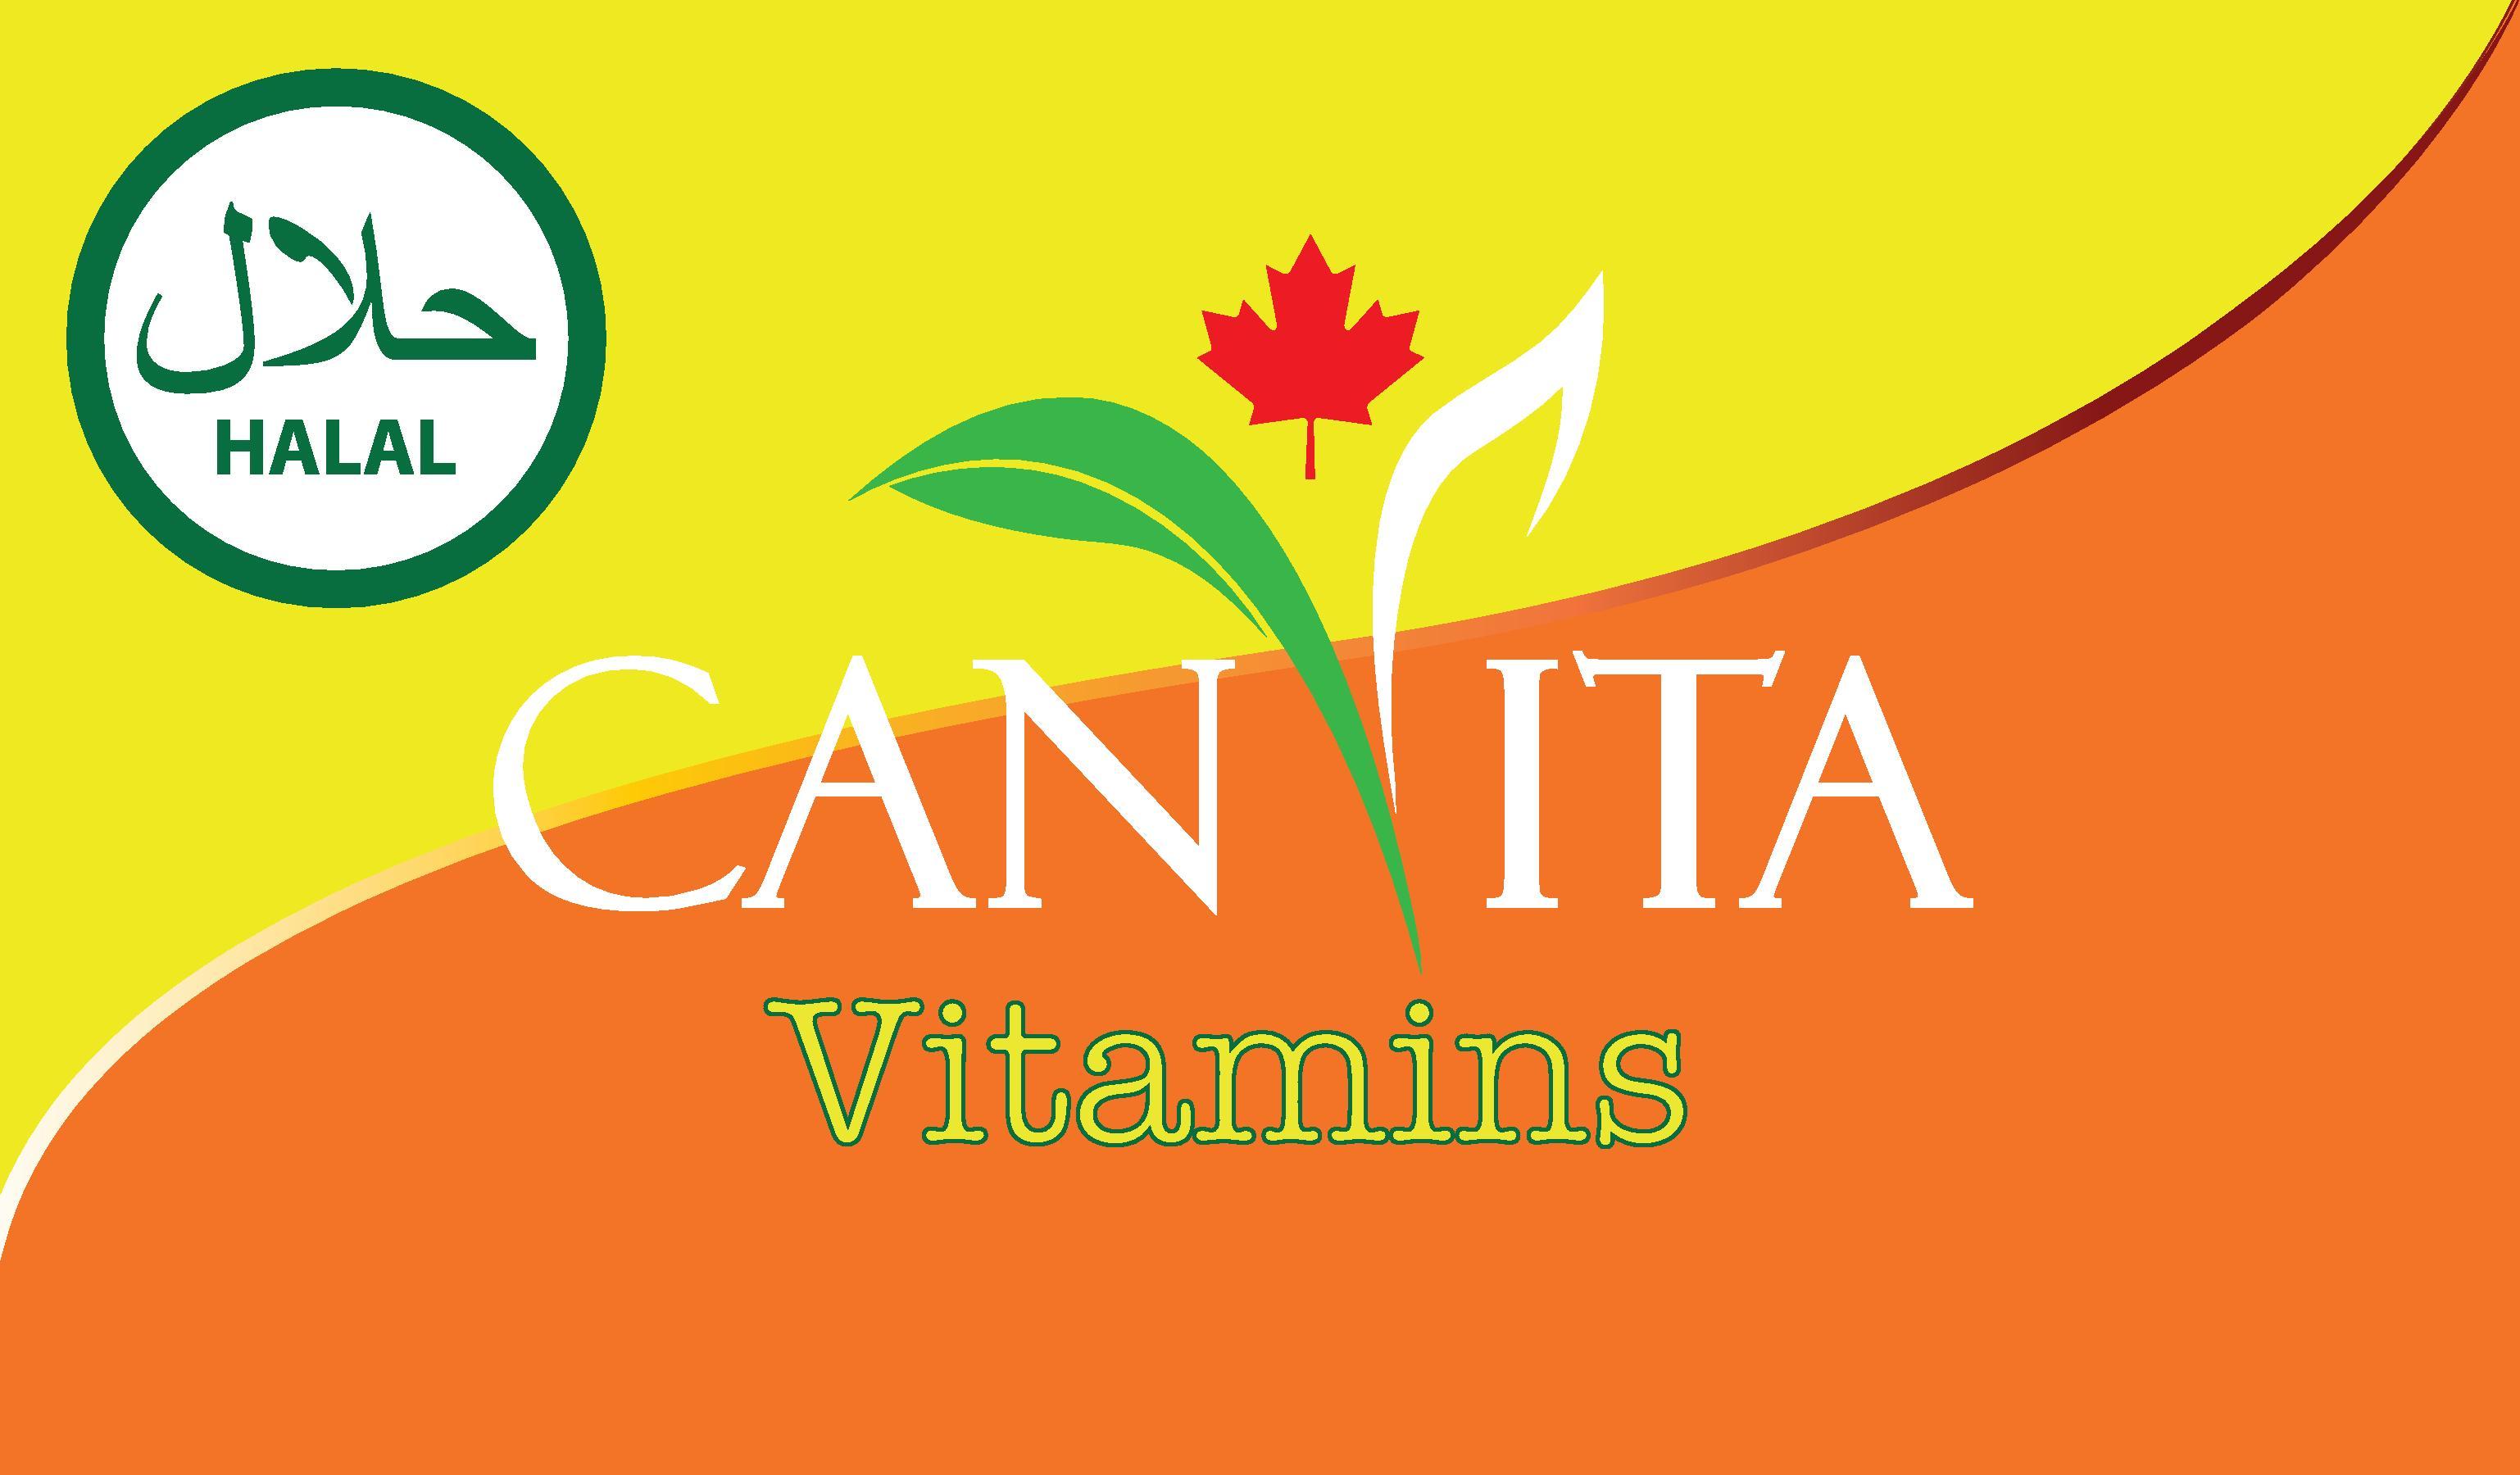 Canvita Halal vitamins